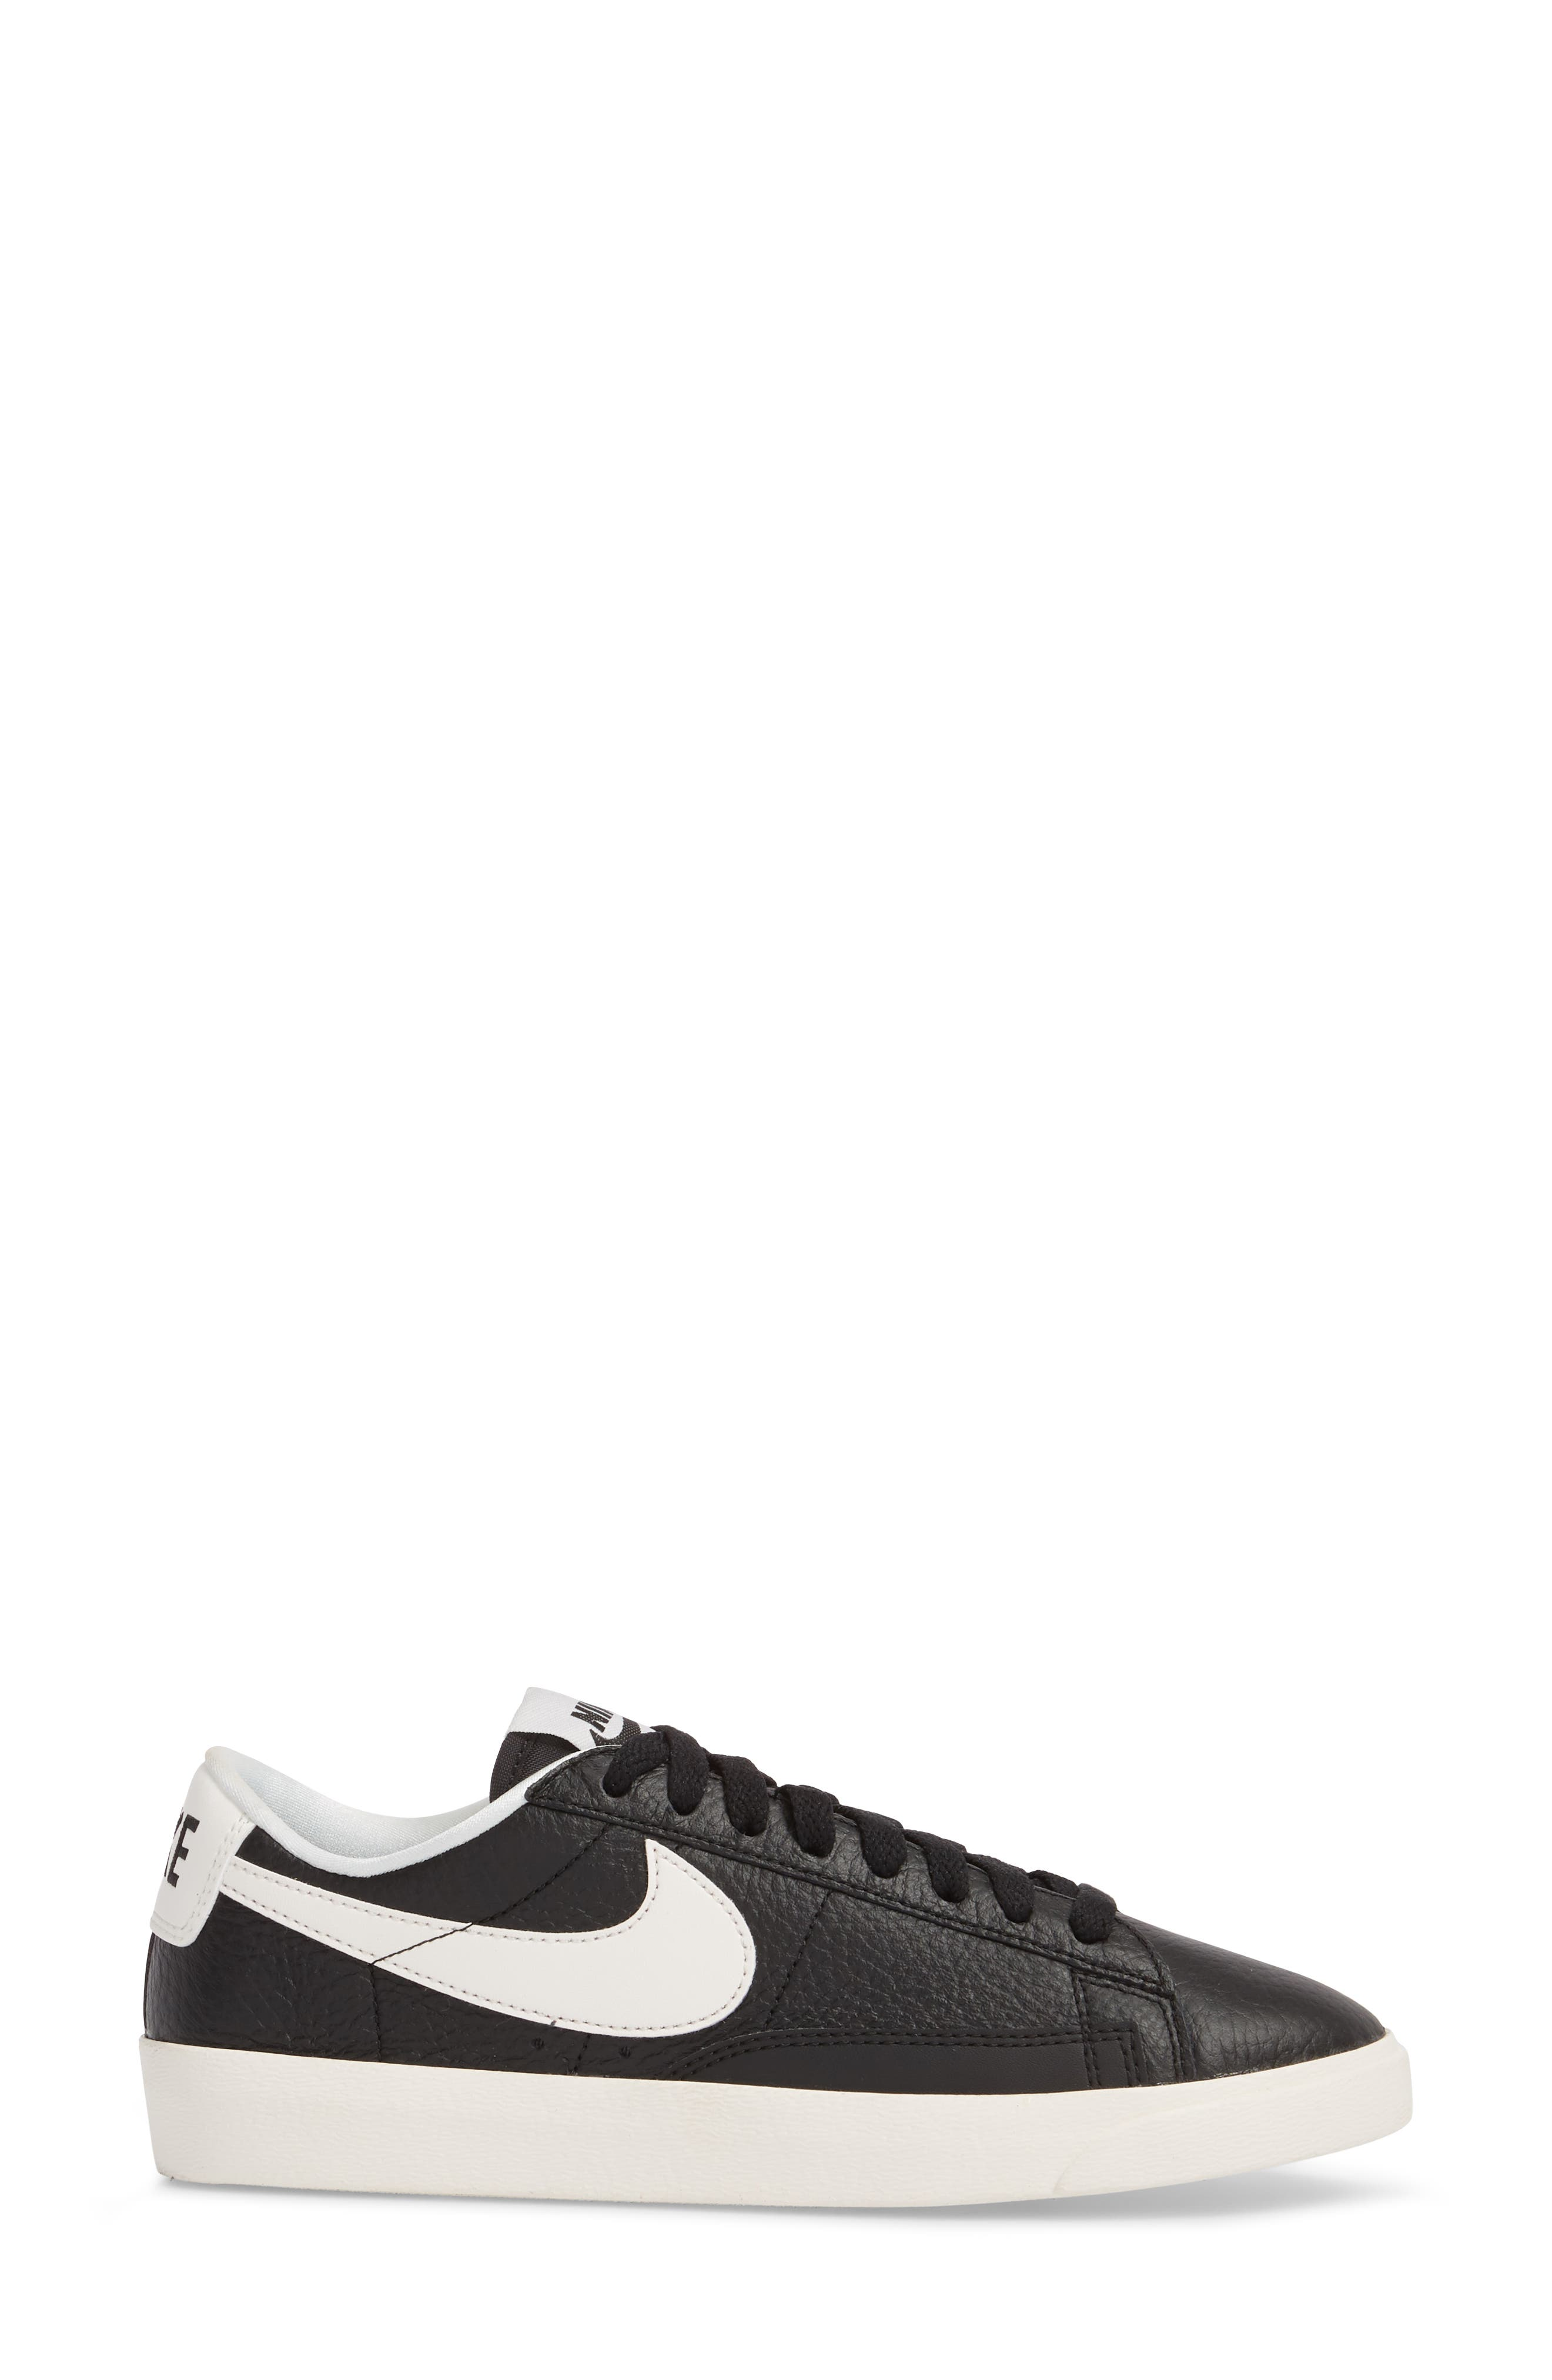 Blazer Premium Low Sneaker,                             Alternate thumbnail 3, color,                             BLACK/ WHITE/ BLACK